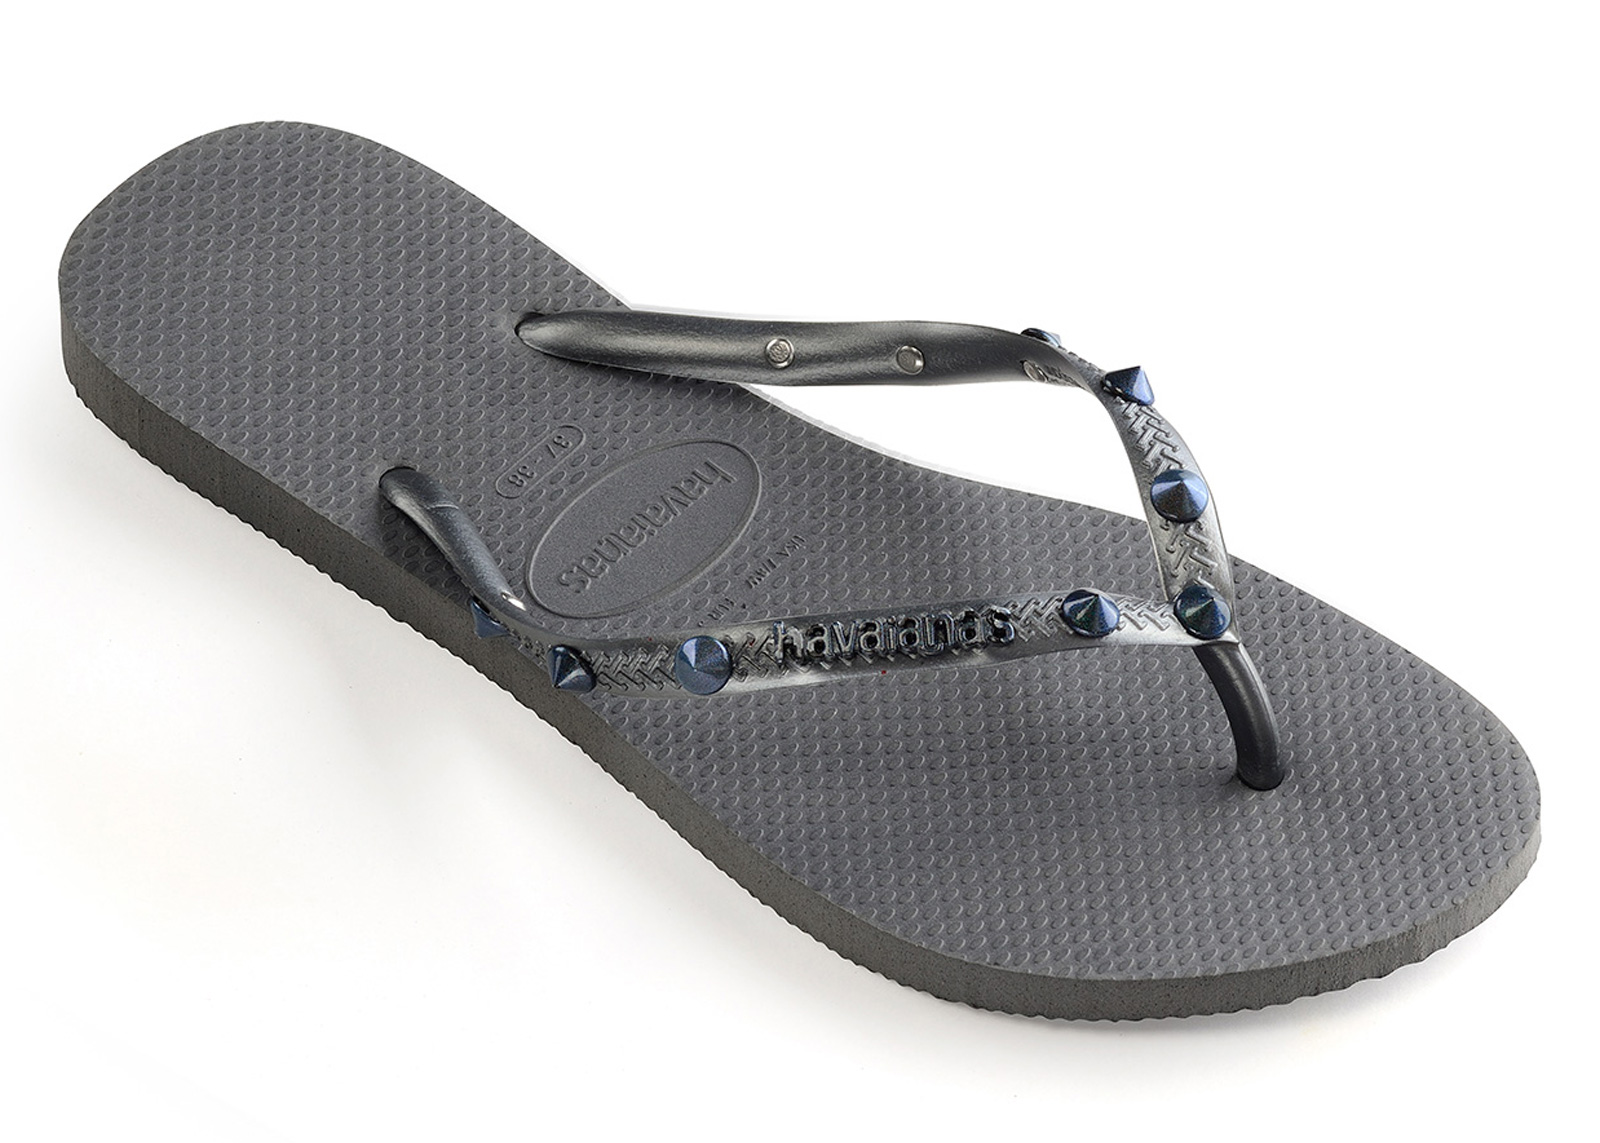 Flip-Flops Slim Hardware Grey-graphite - Brand Havaianas 64b2c88ab3c1